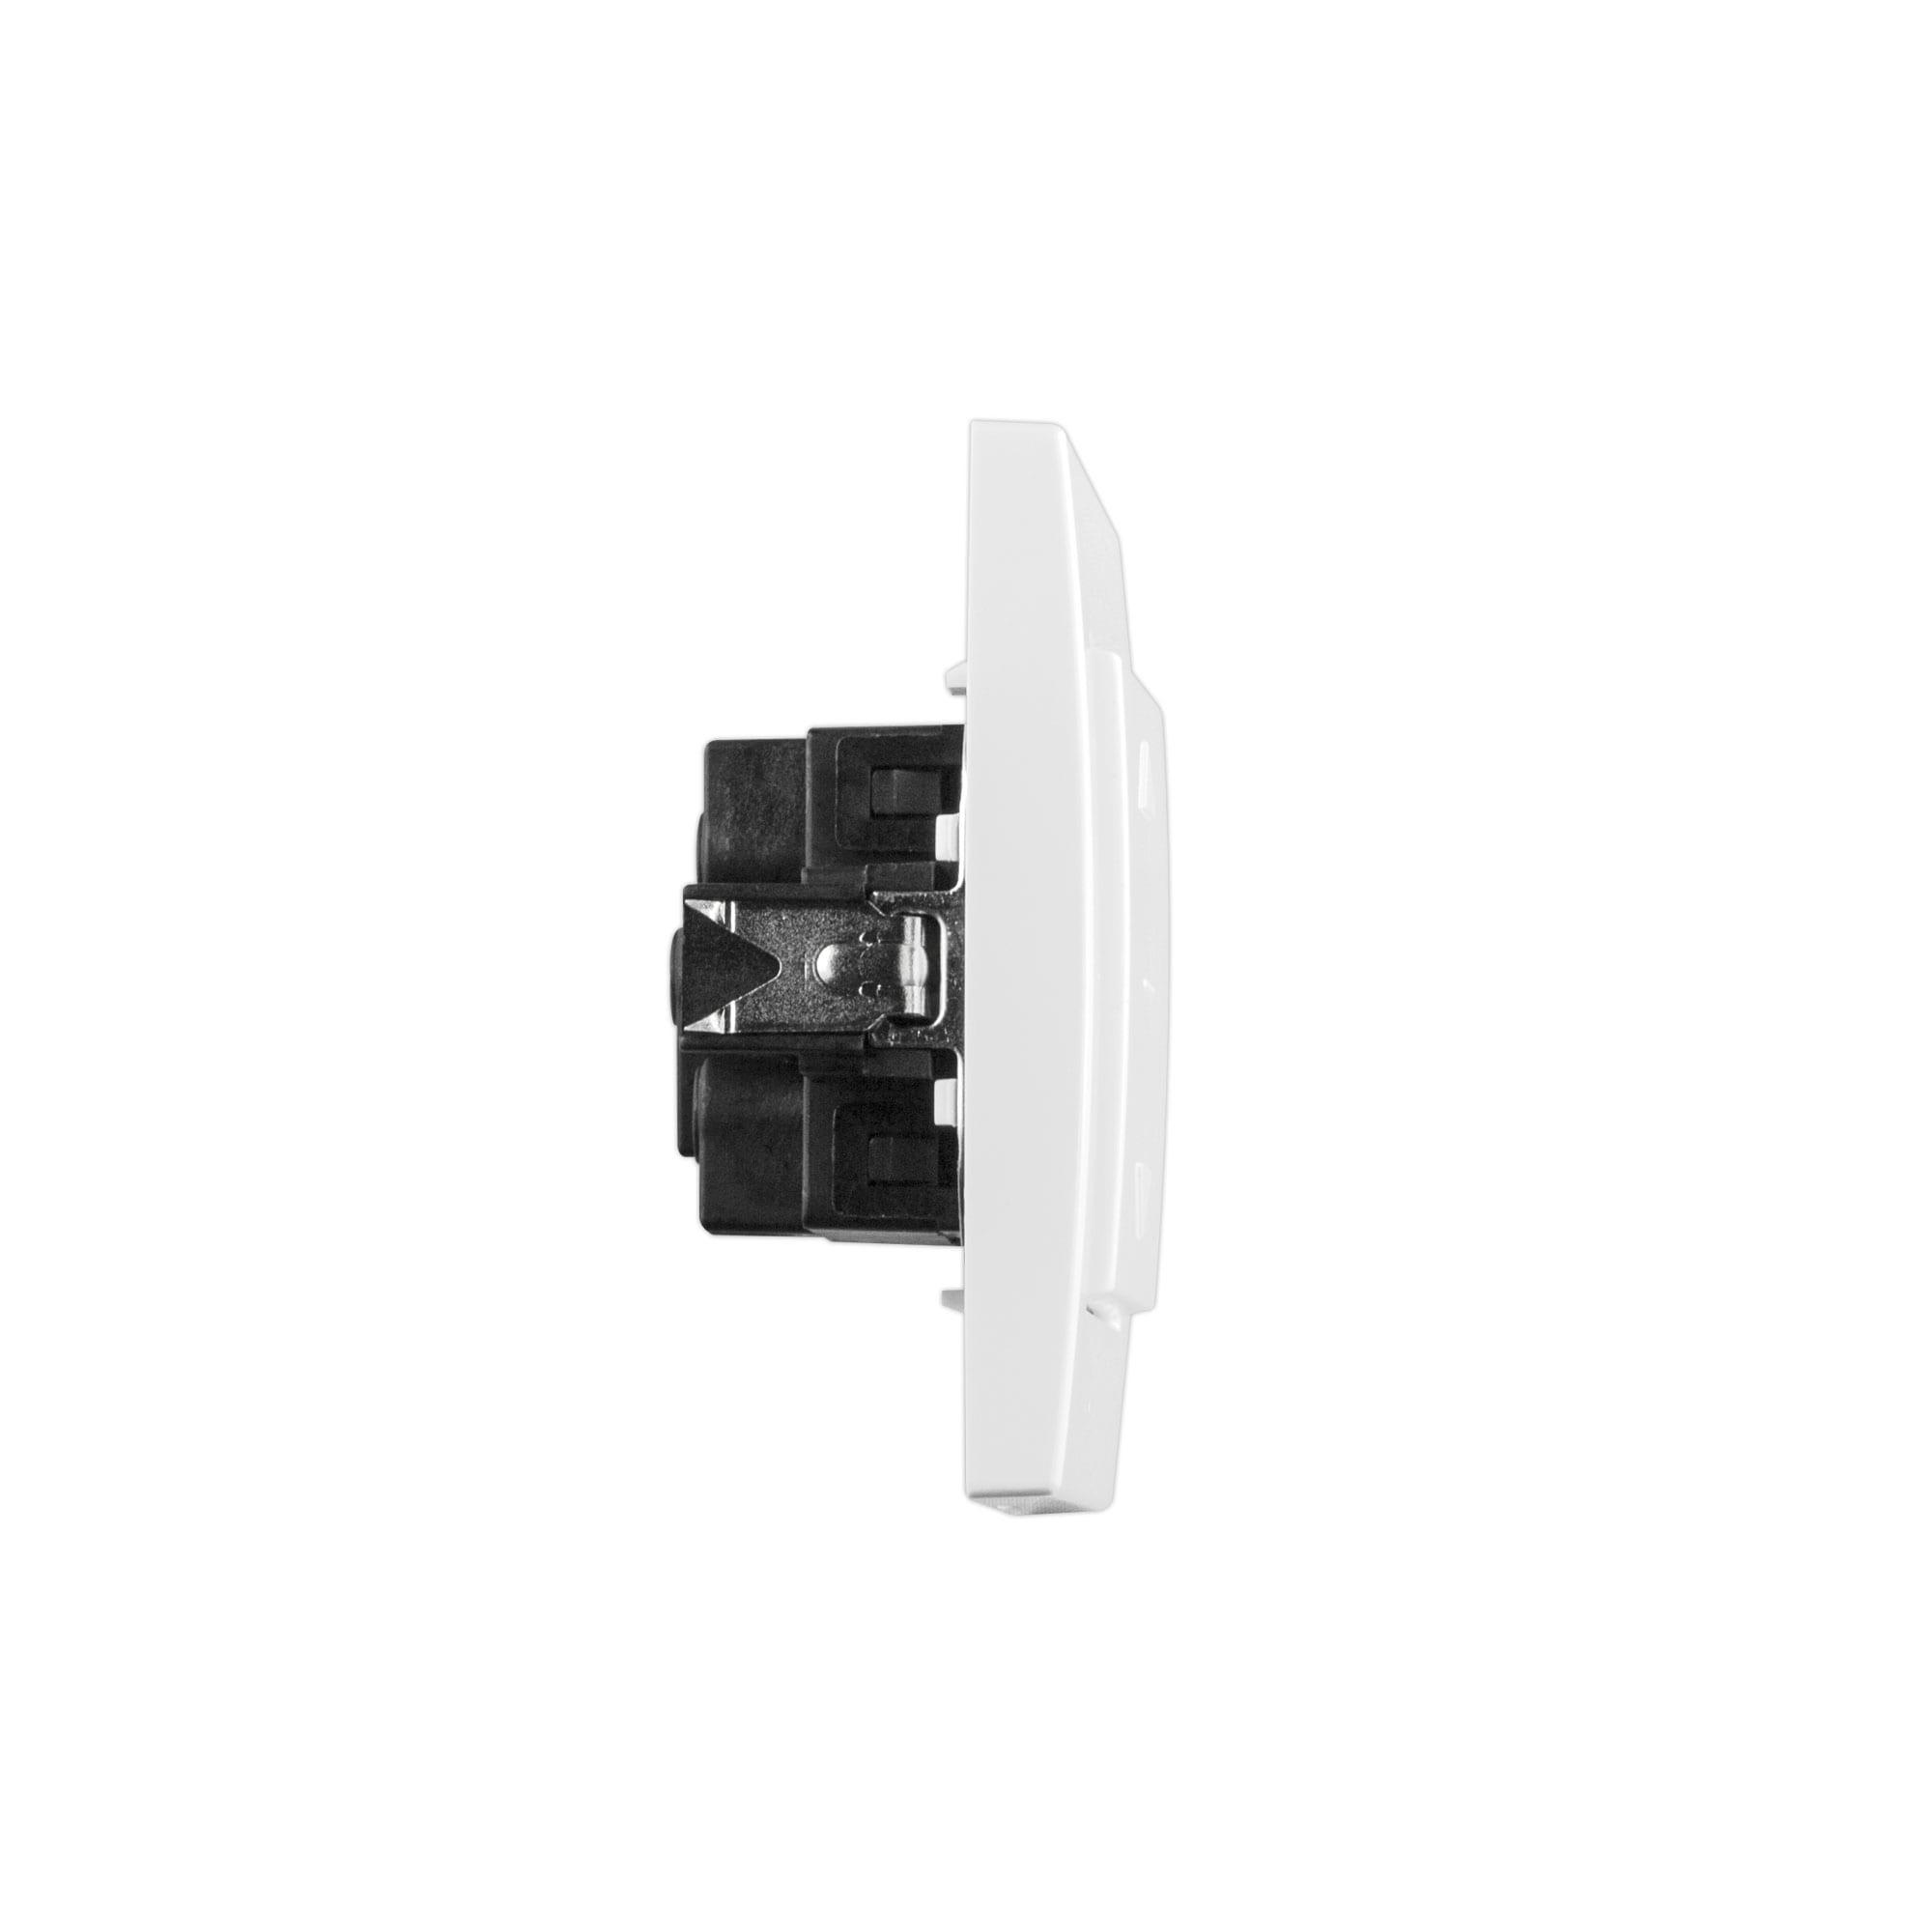 Design Wipptaster Typ 2 inkl. Außenrahmen - JAROLIFT - Jalousiescout.de